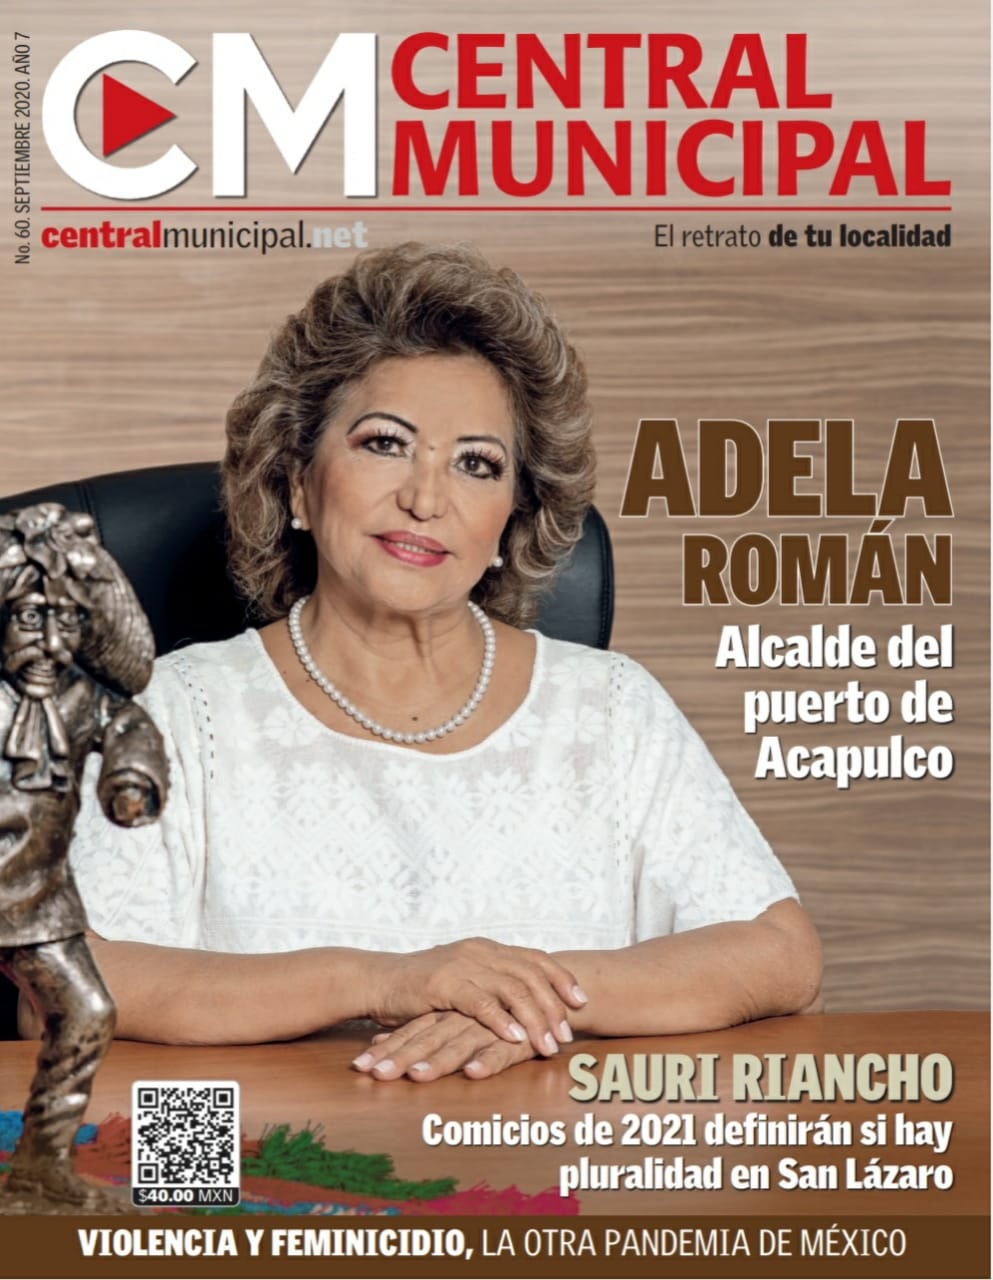 Adela RomanCentral Municipal